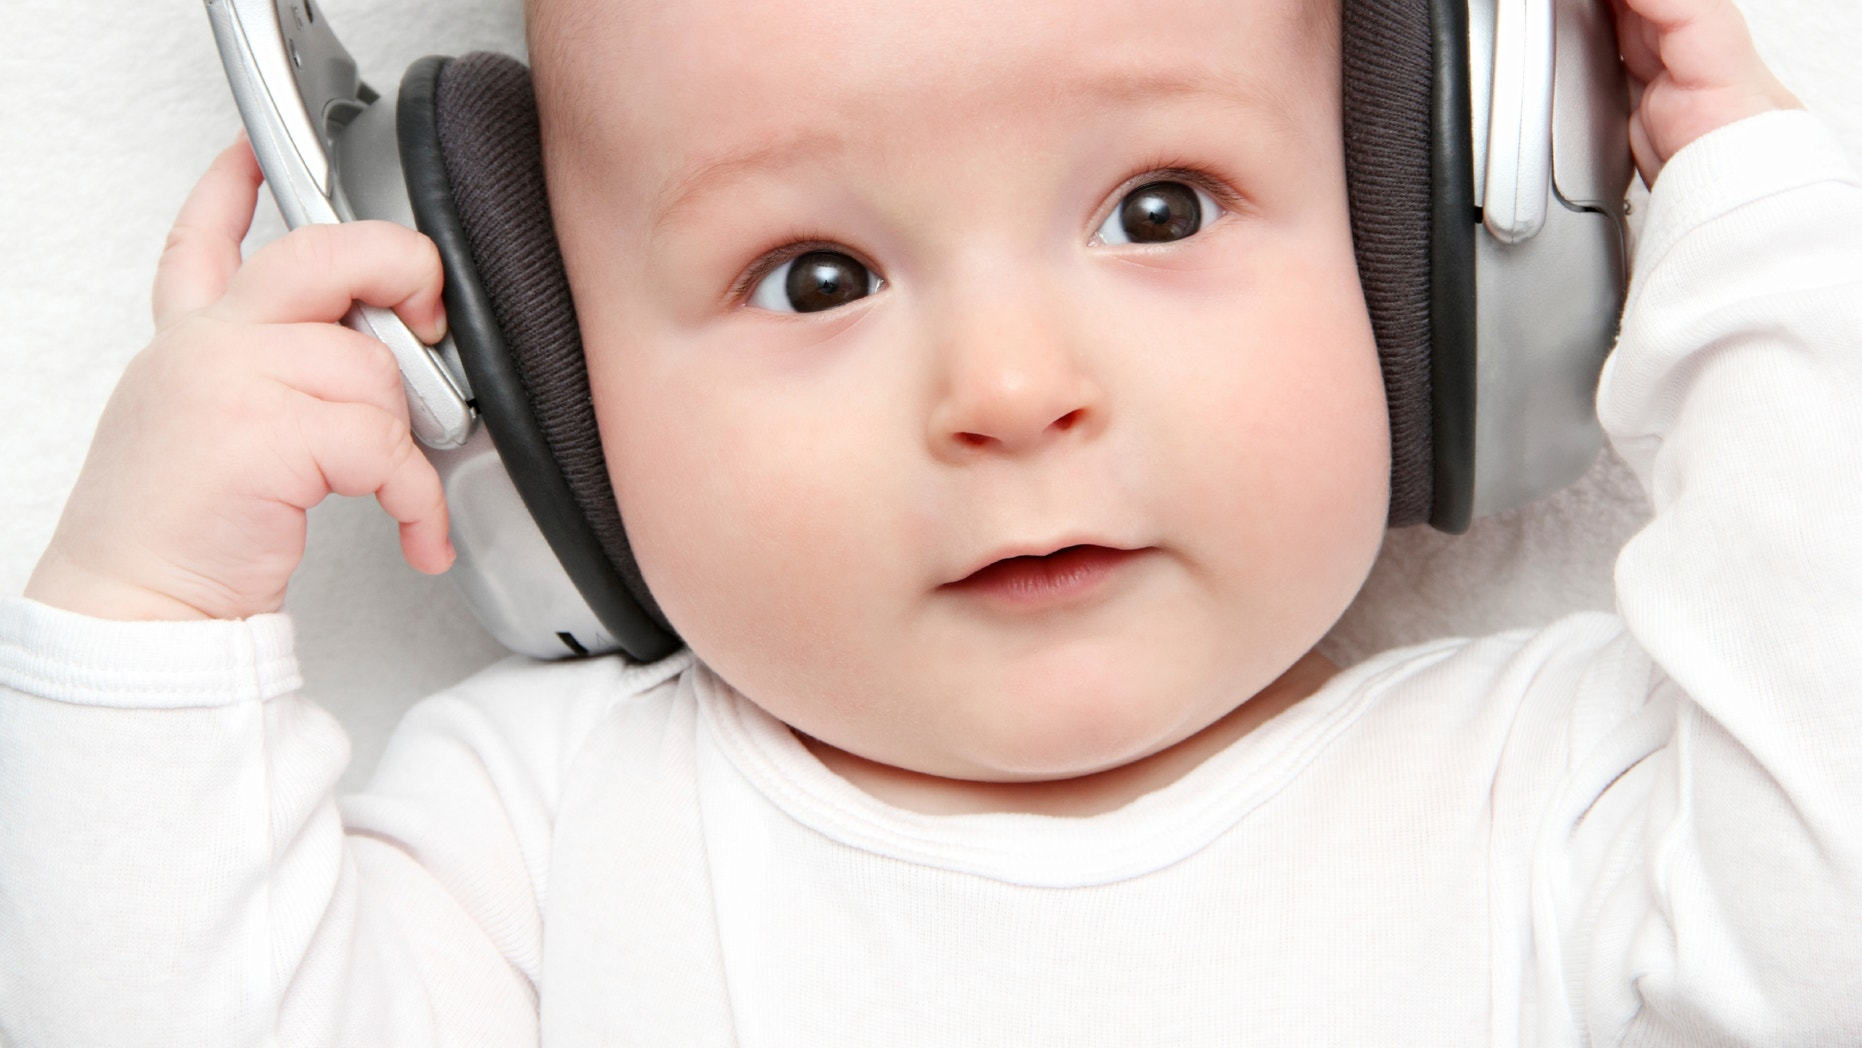 baby listening music on back